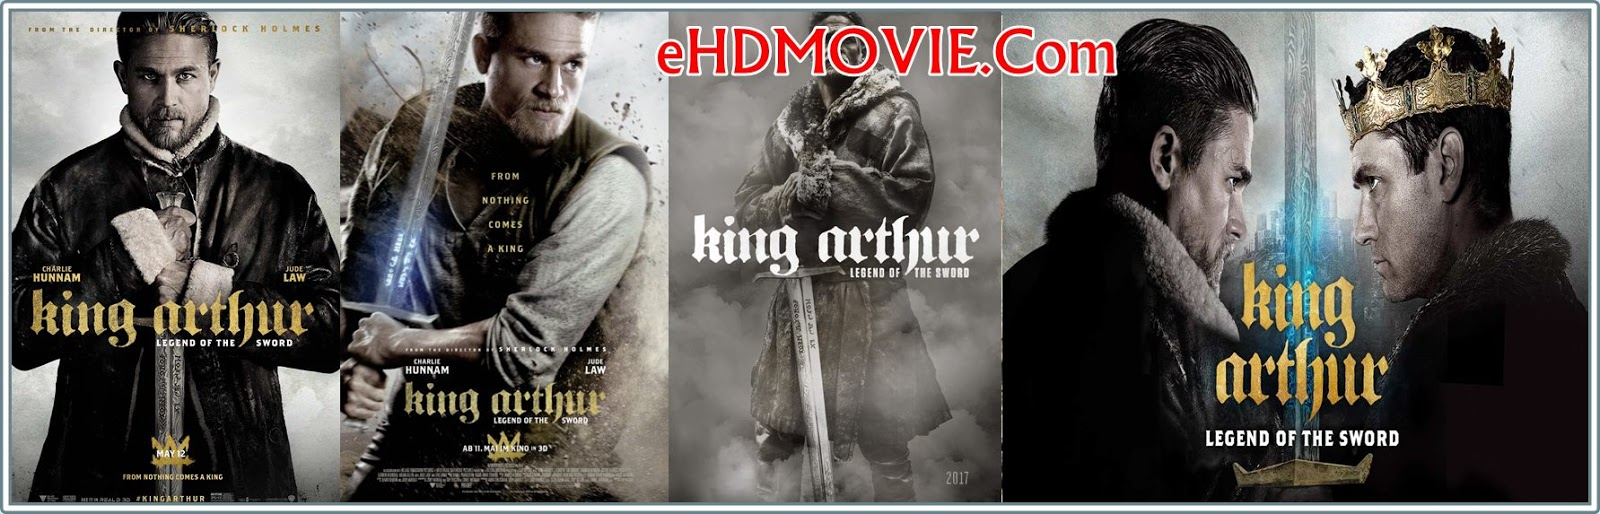 King Arthur: Legend of the Sword 2017 Full Movie English 720p - 480p ORG BRRip 450MB - 1GB ESubs Free Download